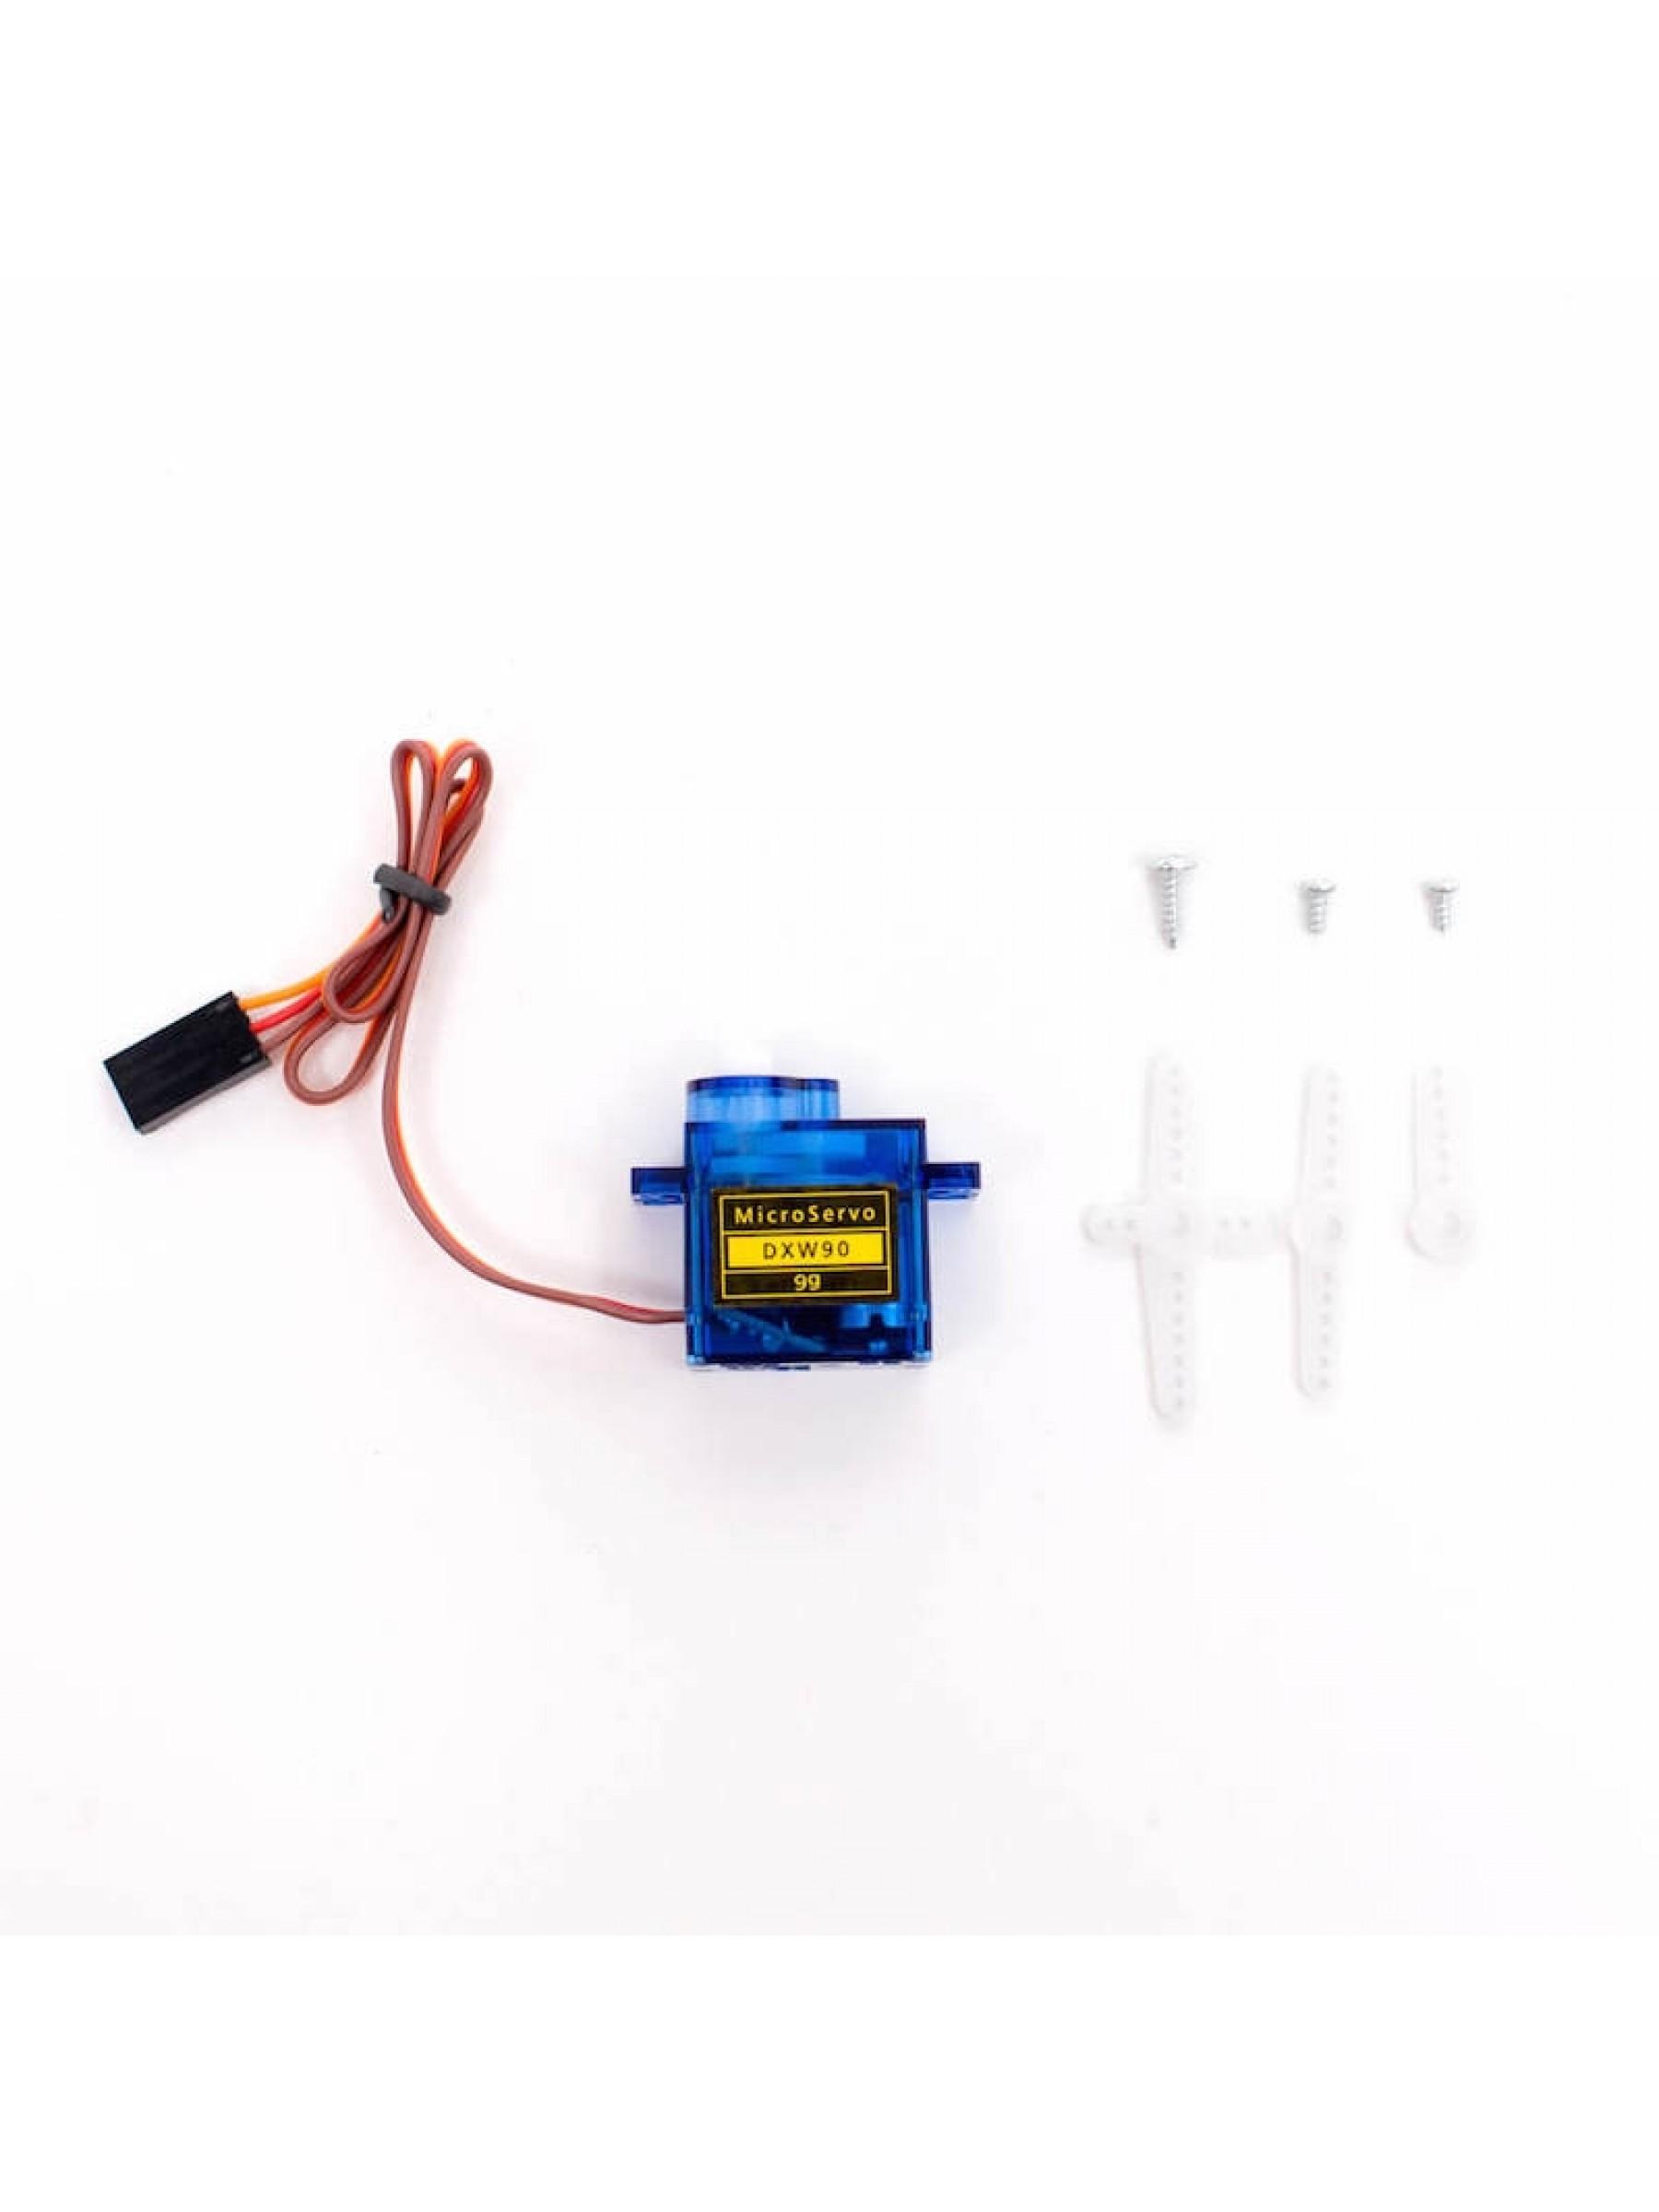 Servo Motor for Raspberry Pi - Set of 4 Small